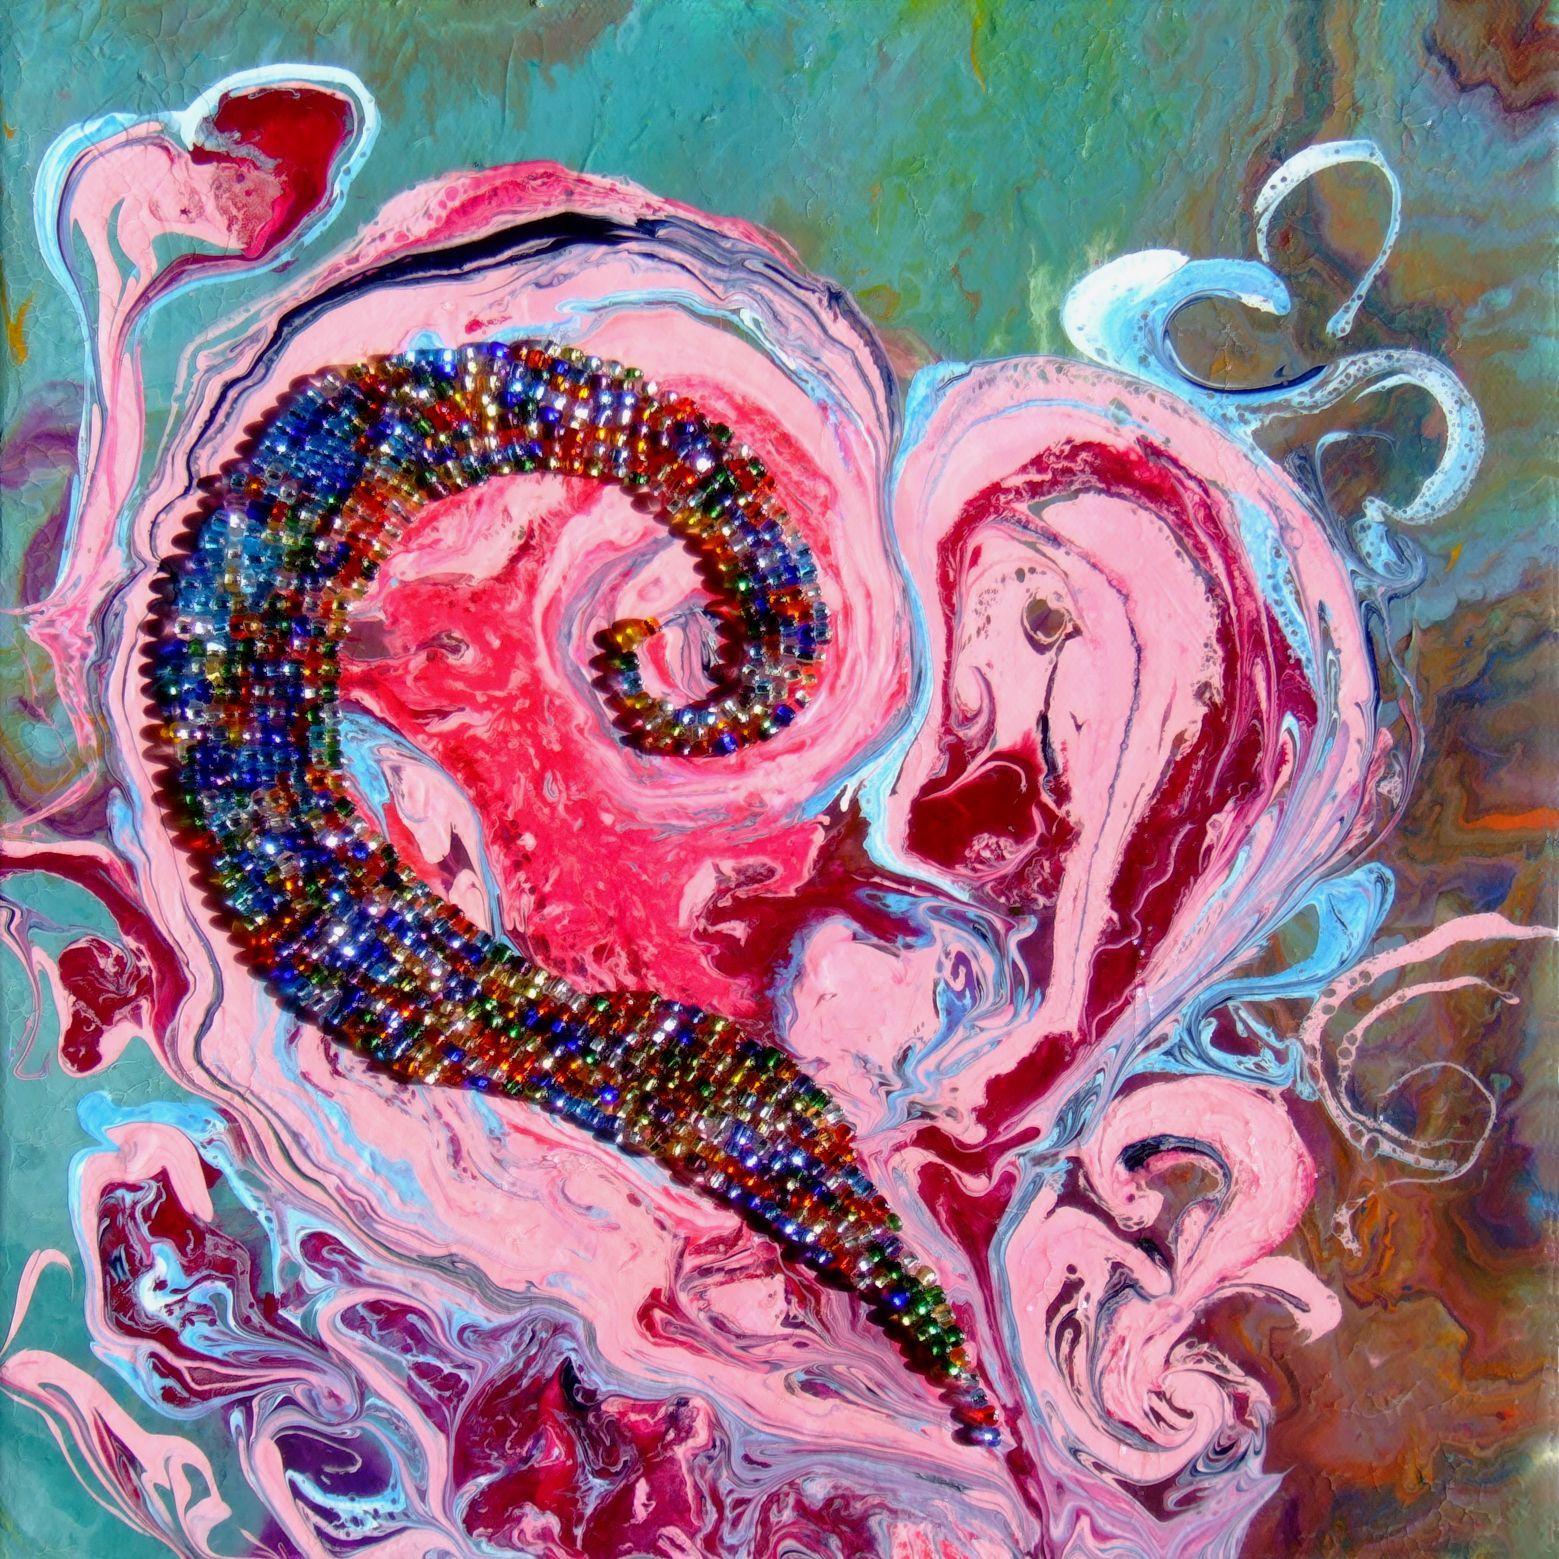 02 rainbow heart 12x12x0.75 lppbuu